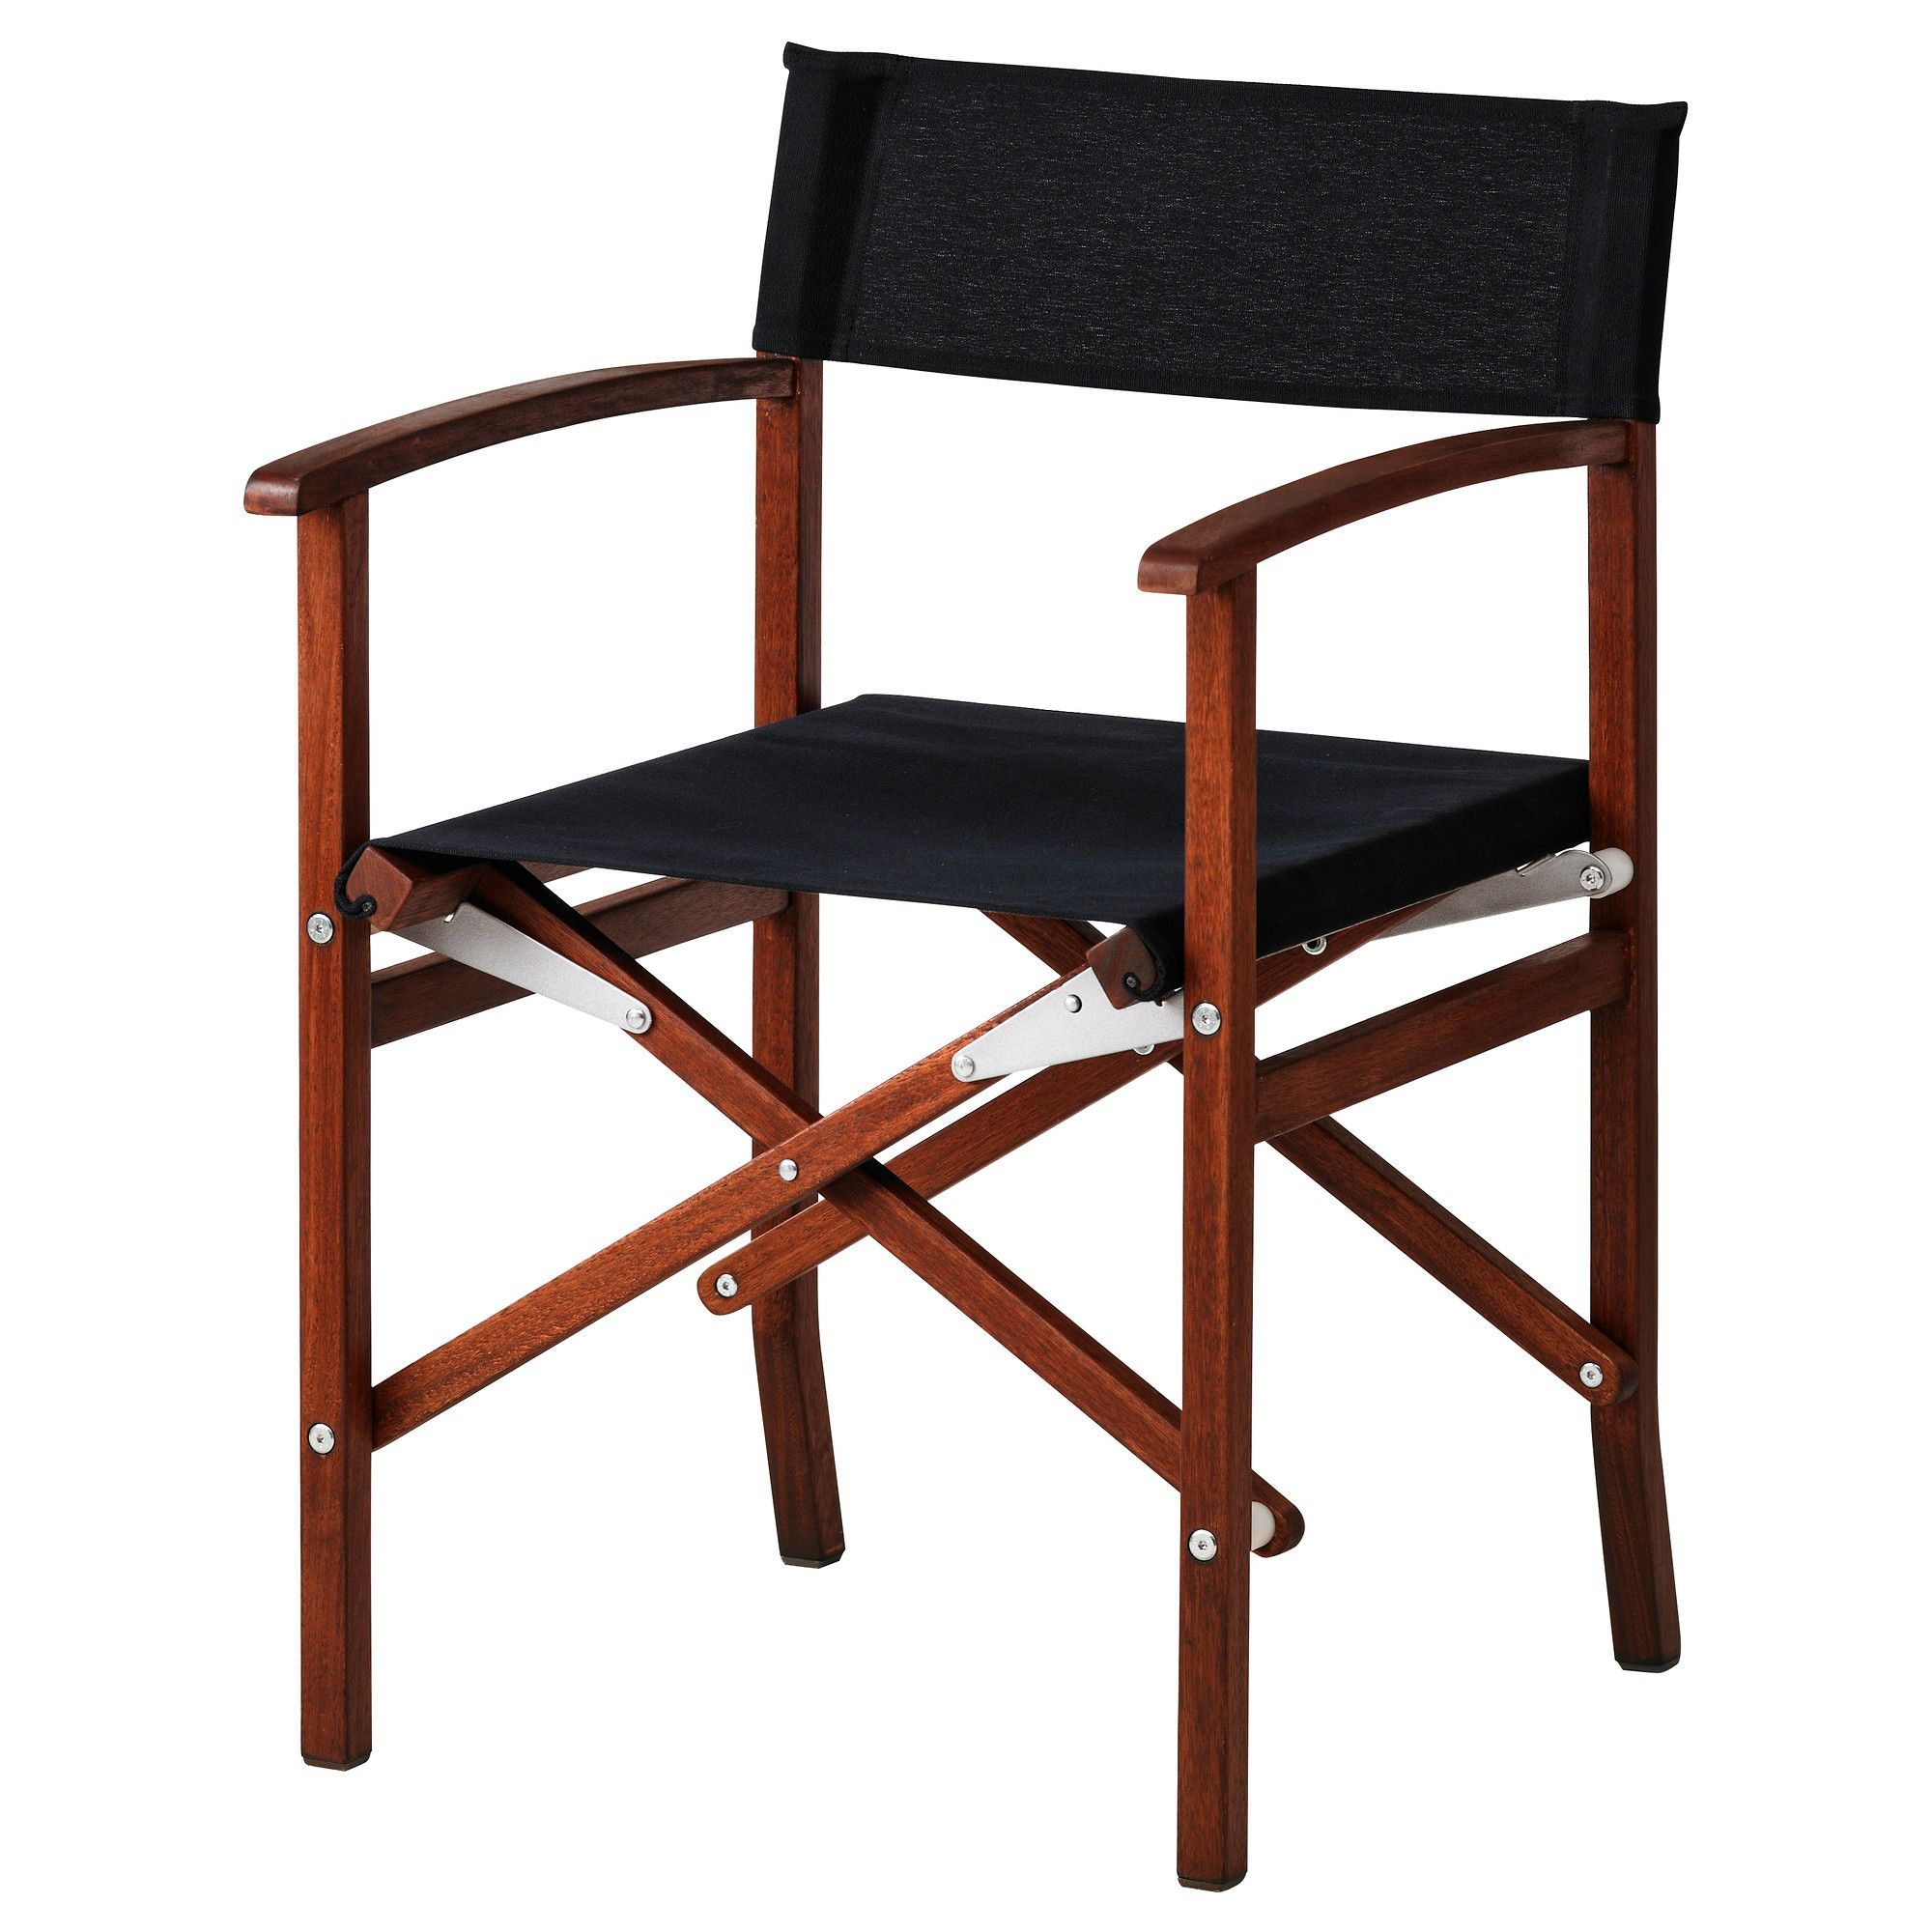 Mobel Einrichtungsideen Fur Dein Zuhause Ikea Garden Furniture Outdoor Dining Chairs Directors Chair